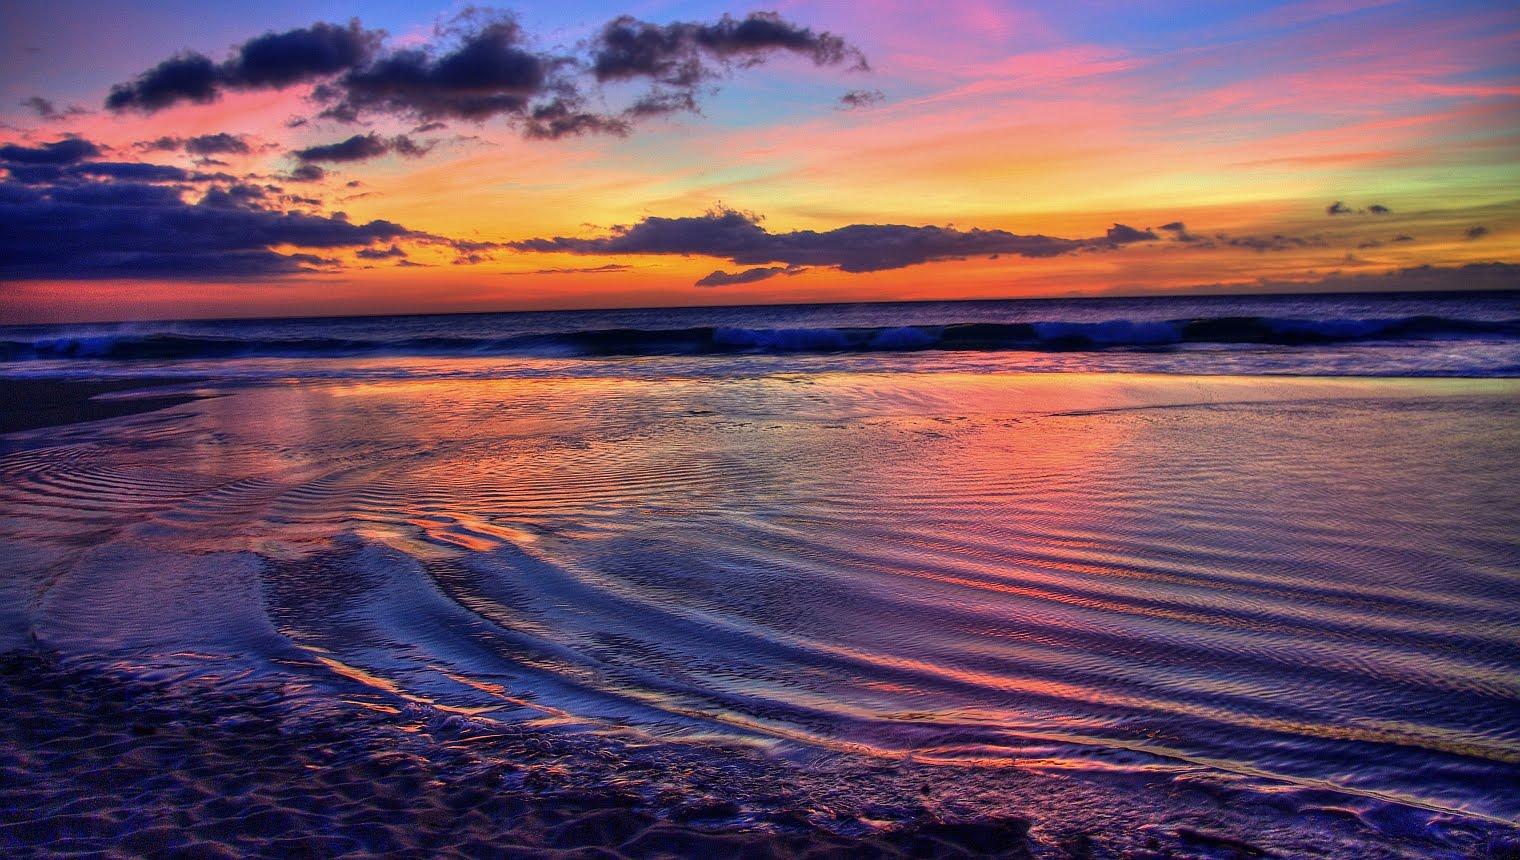 Hawaiian Sunset Wallpaper Hawaiian sunset wallpaper 1520x860